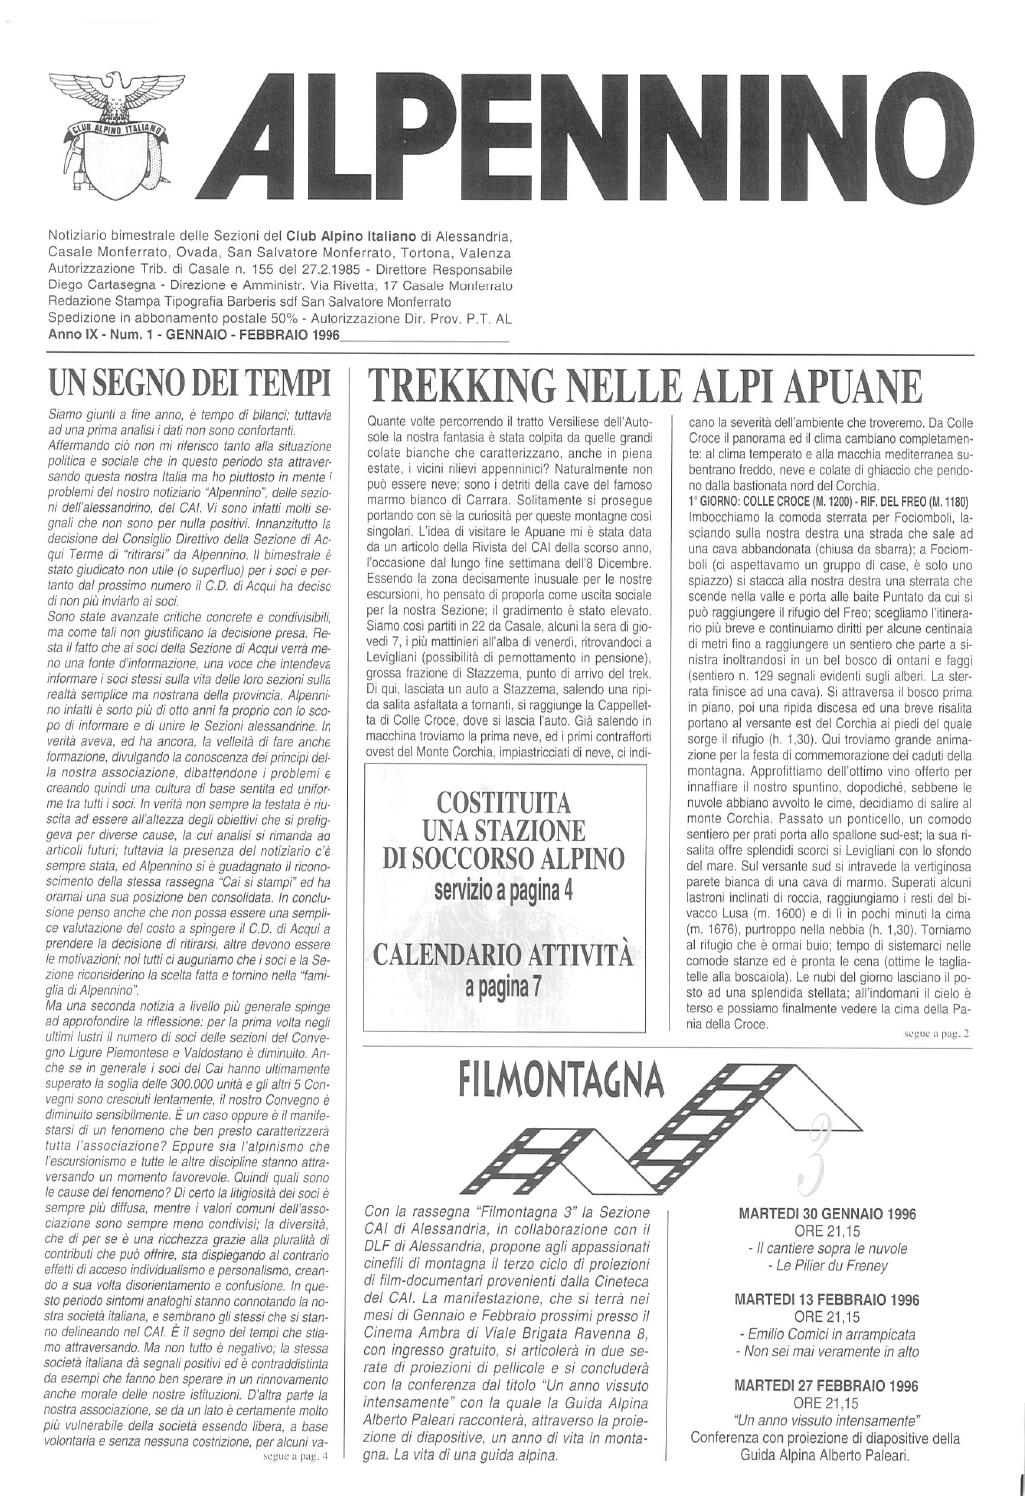 Calendario 1996.Alpennino 1996 N 1 By Federico Omodeo Issuu